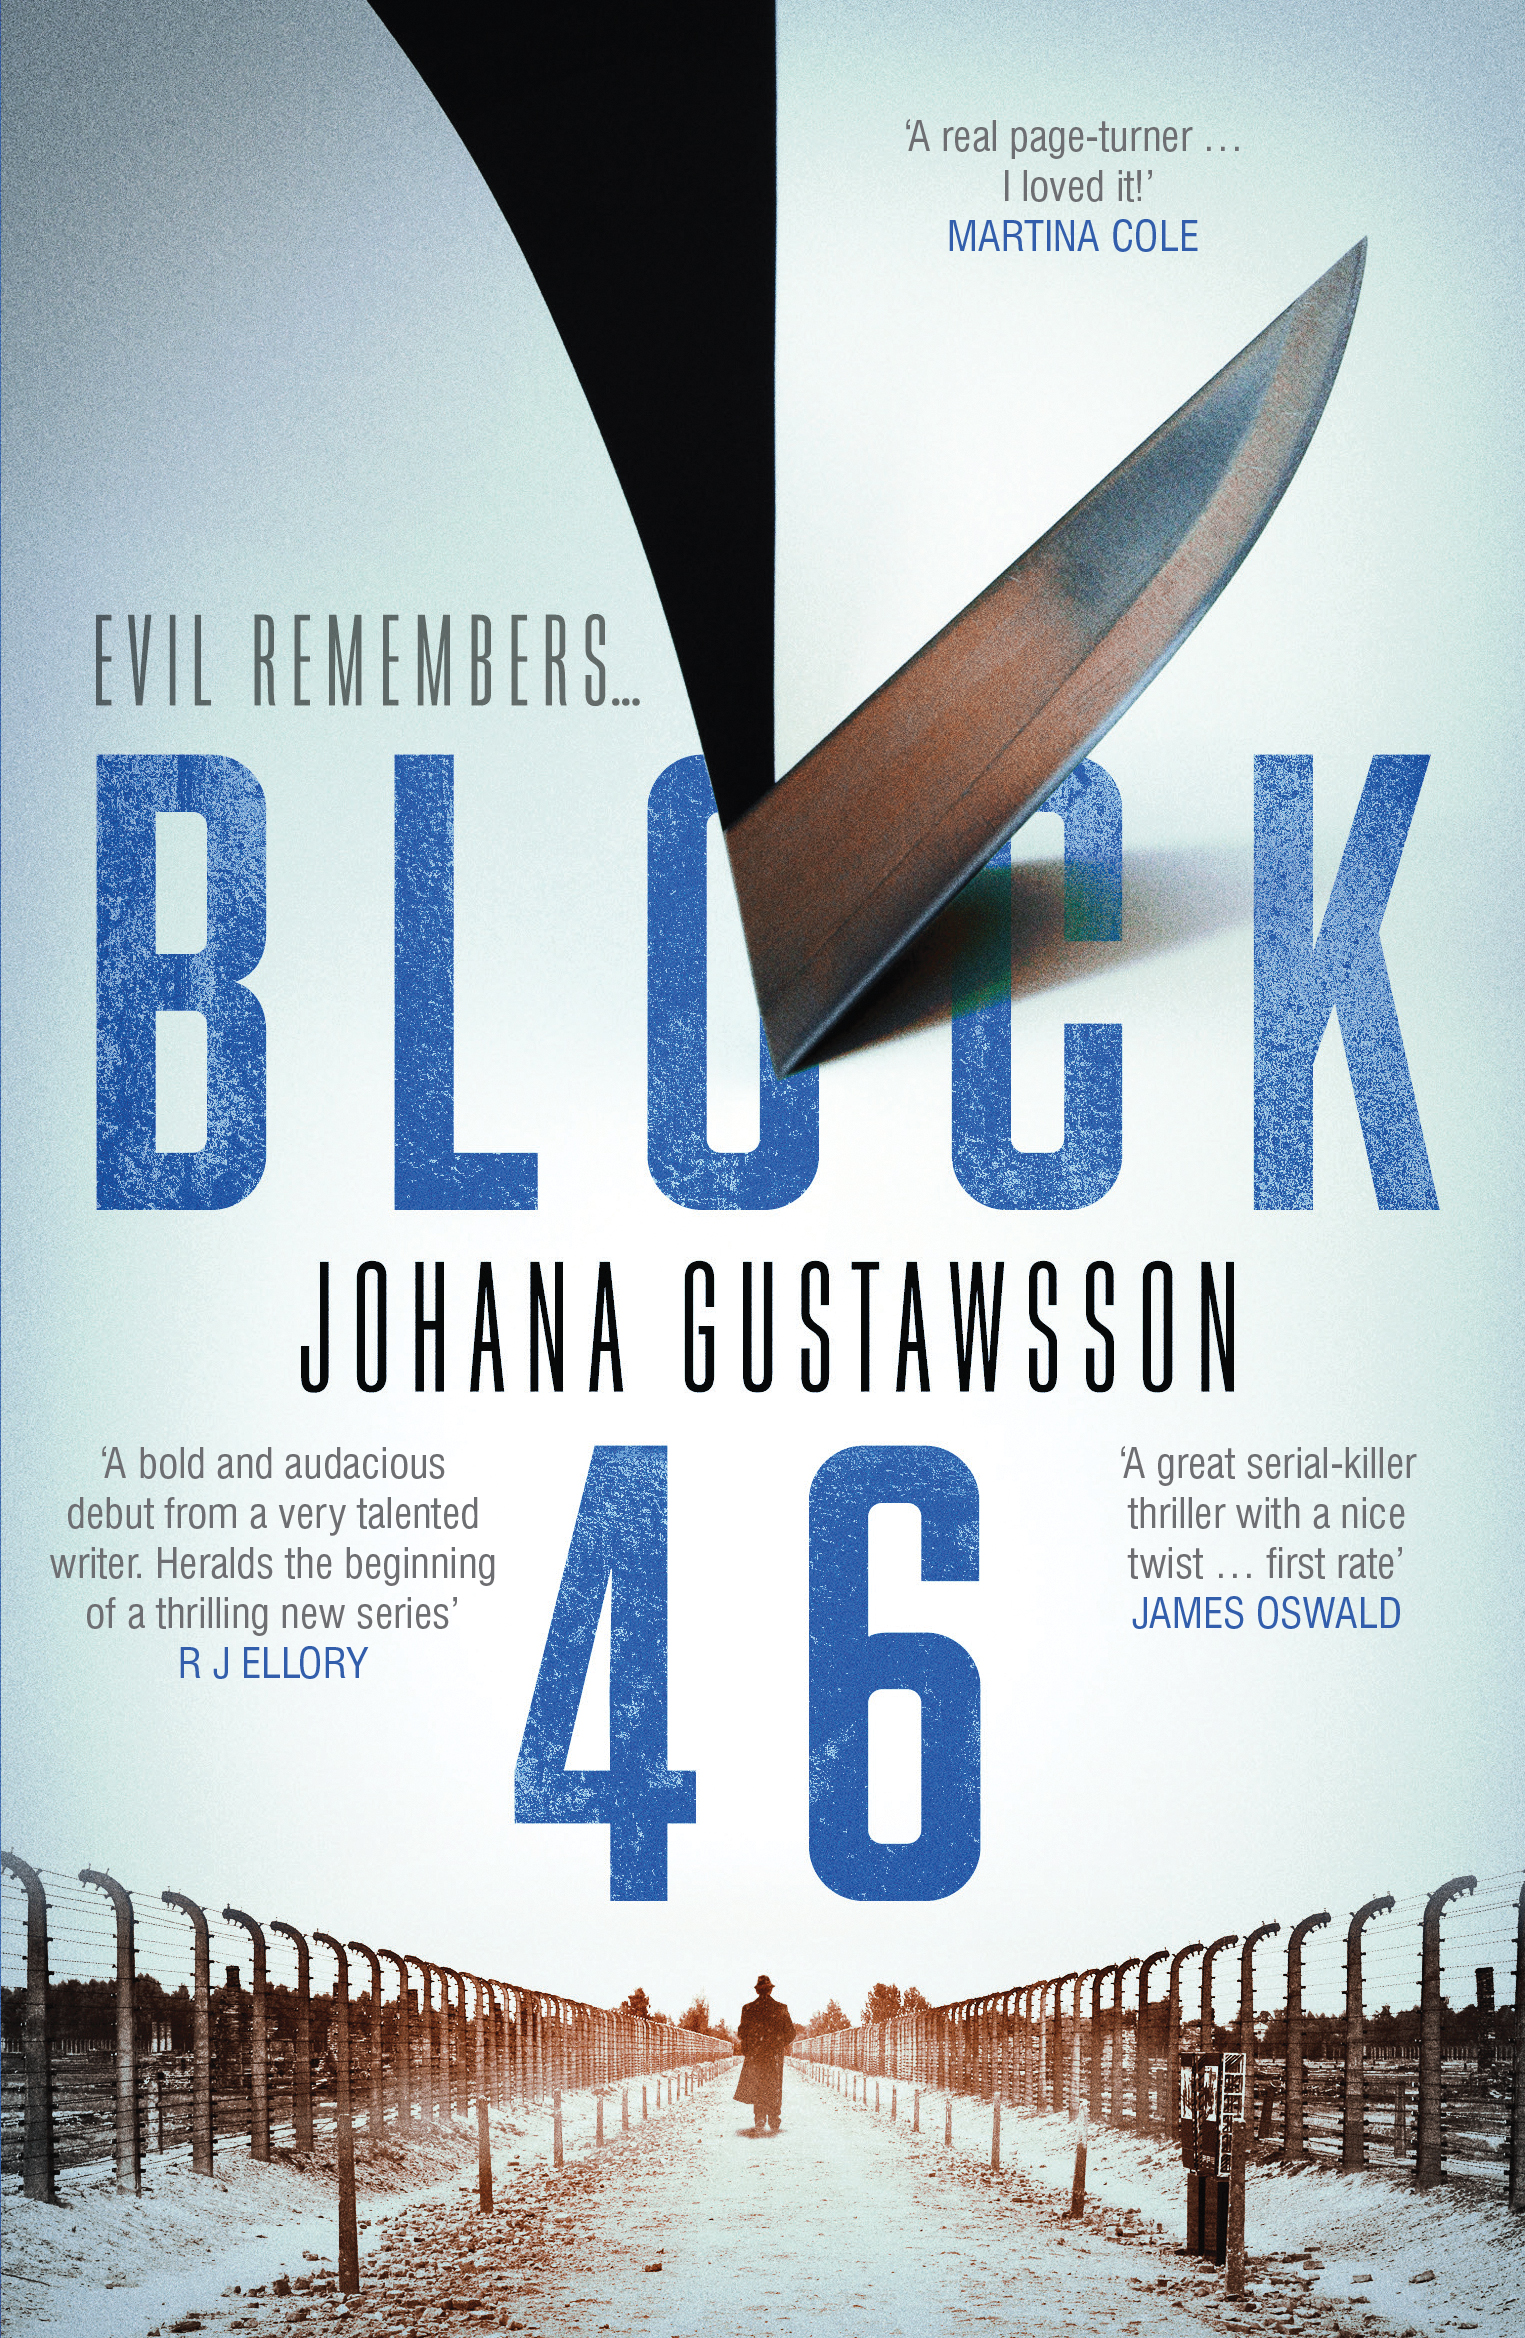 Orenda Books' Johana Gustawsson wins Palai D'Or and a TV deal